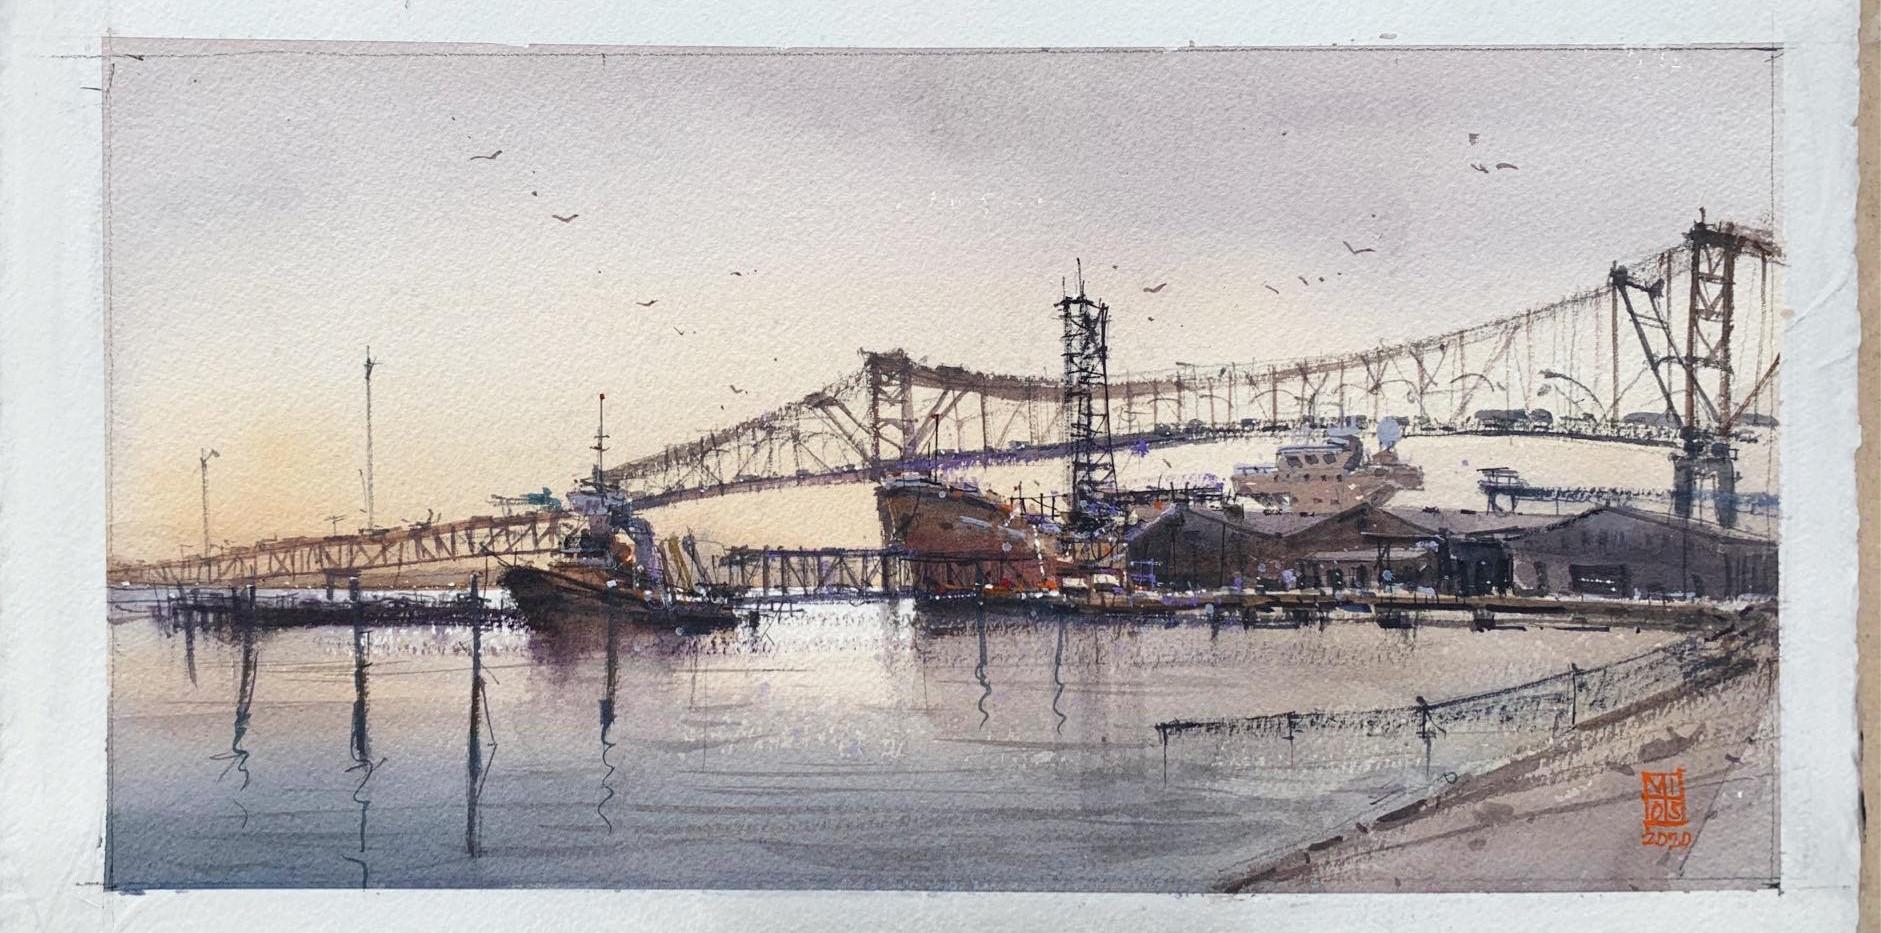 West Baton Rouge Bridge